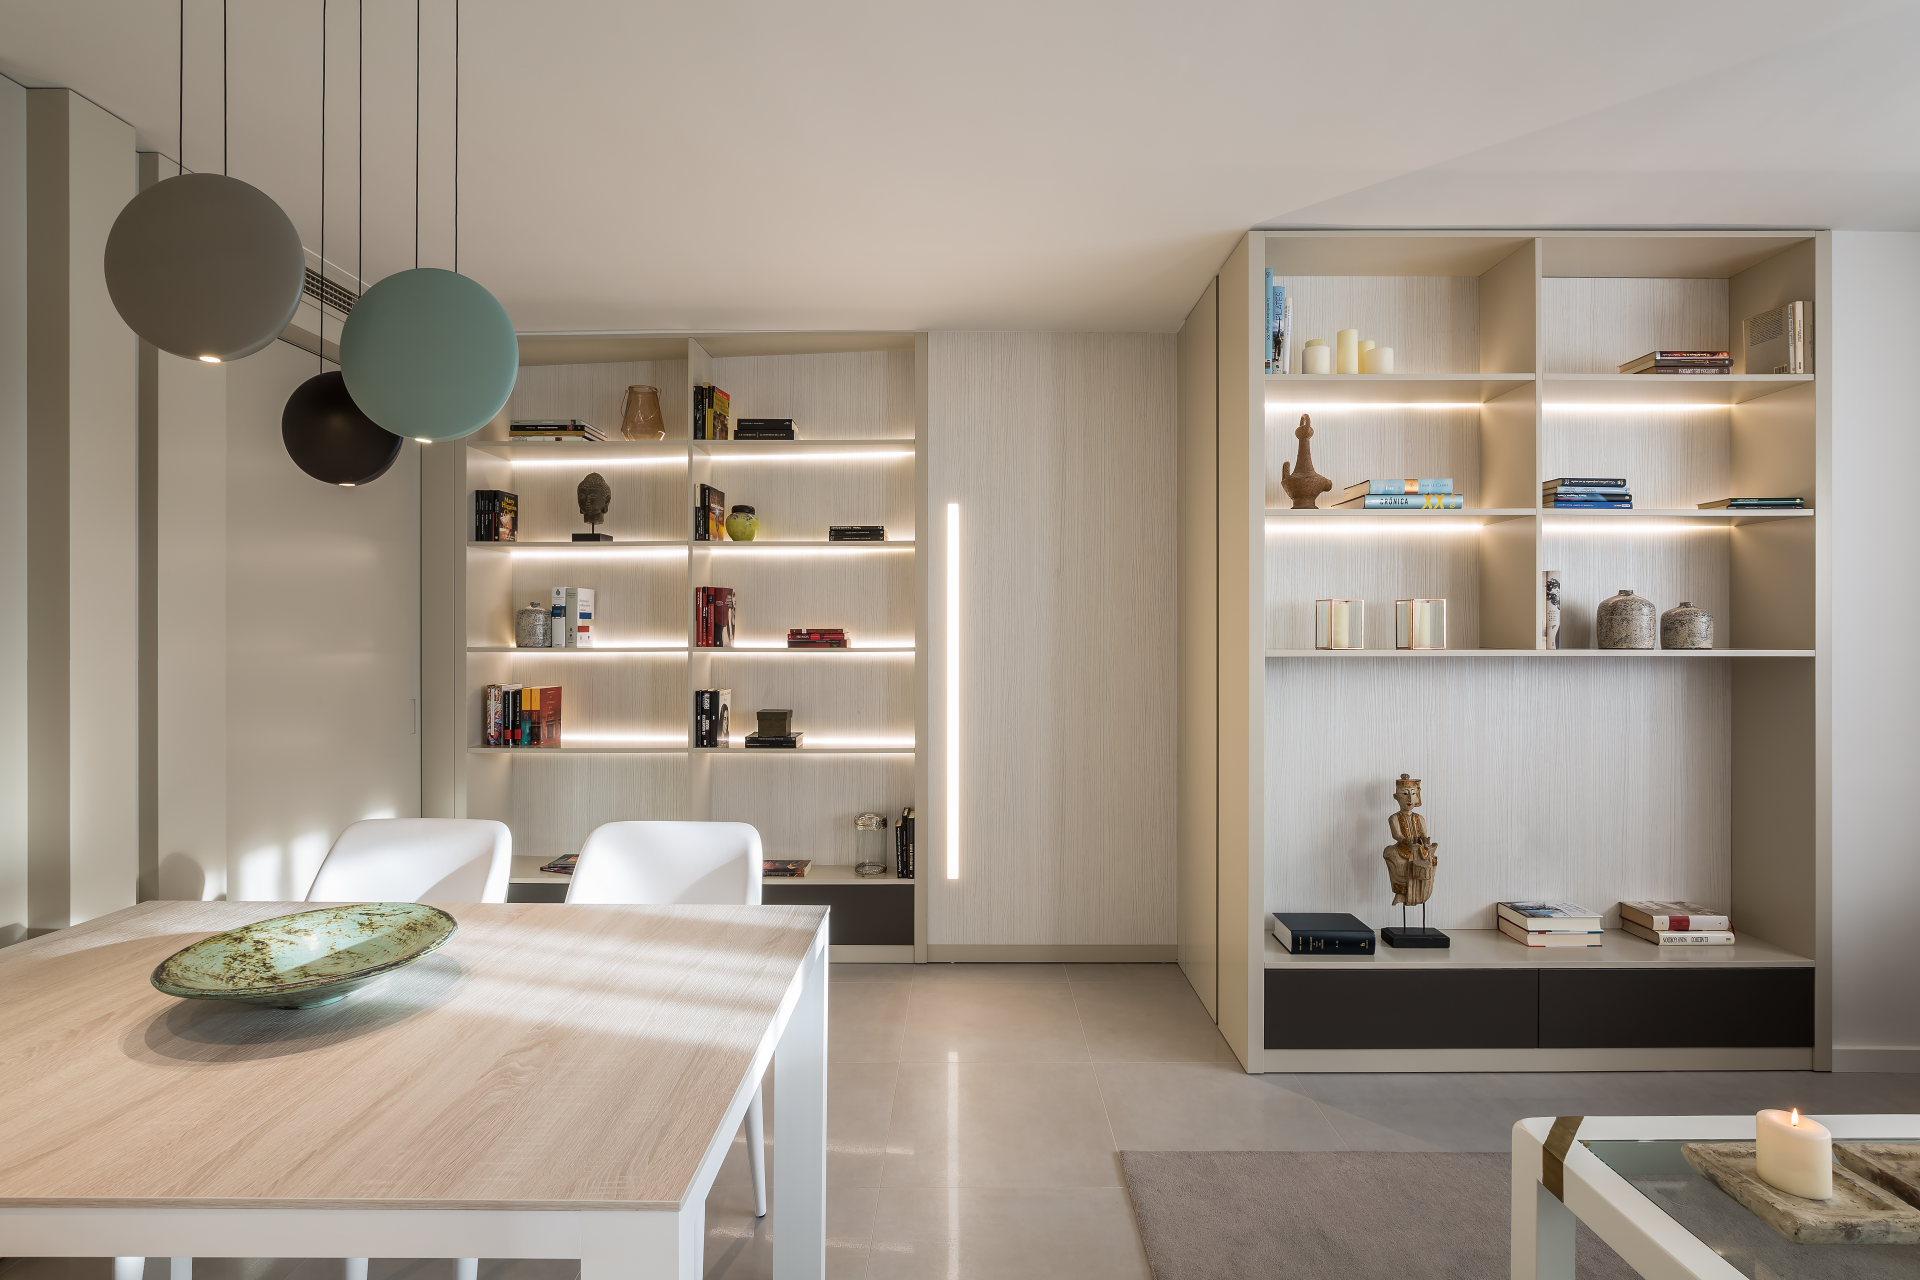 fotografia-arquitectura-interiorismo-valencia-fenollar-german-cabo-laura-yerpes  (5)